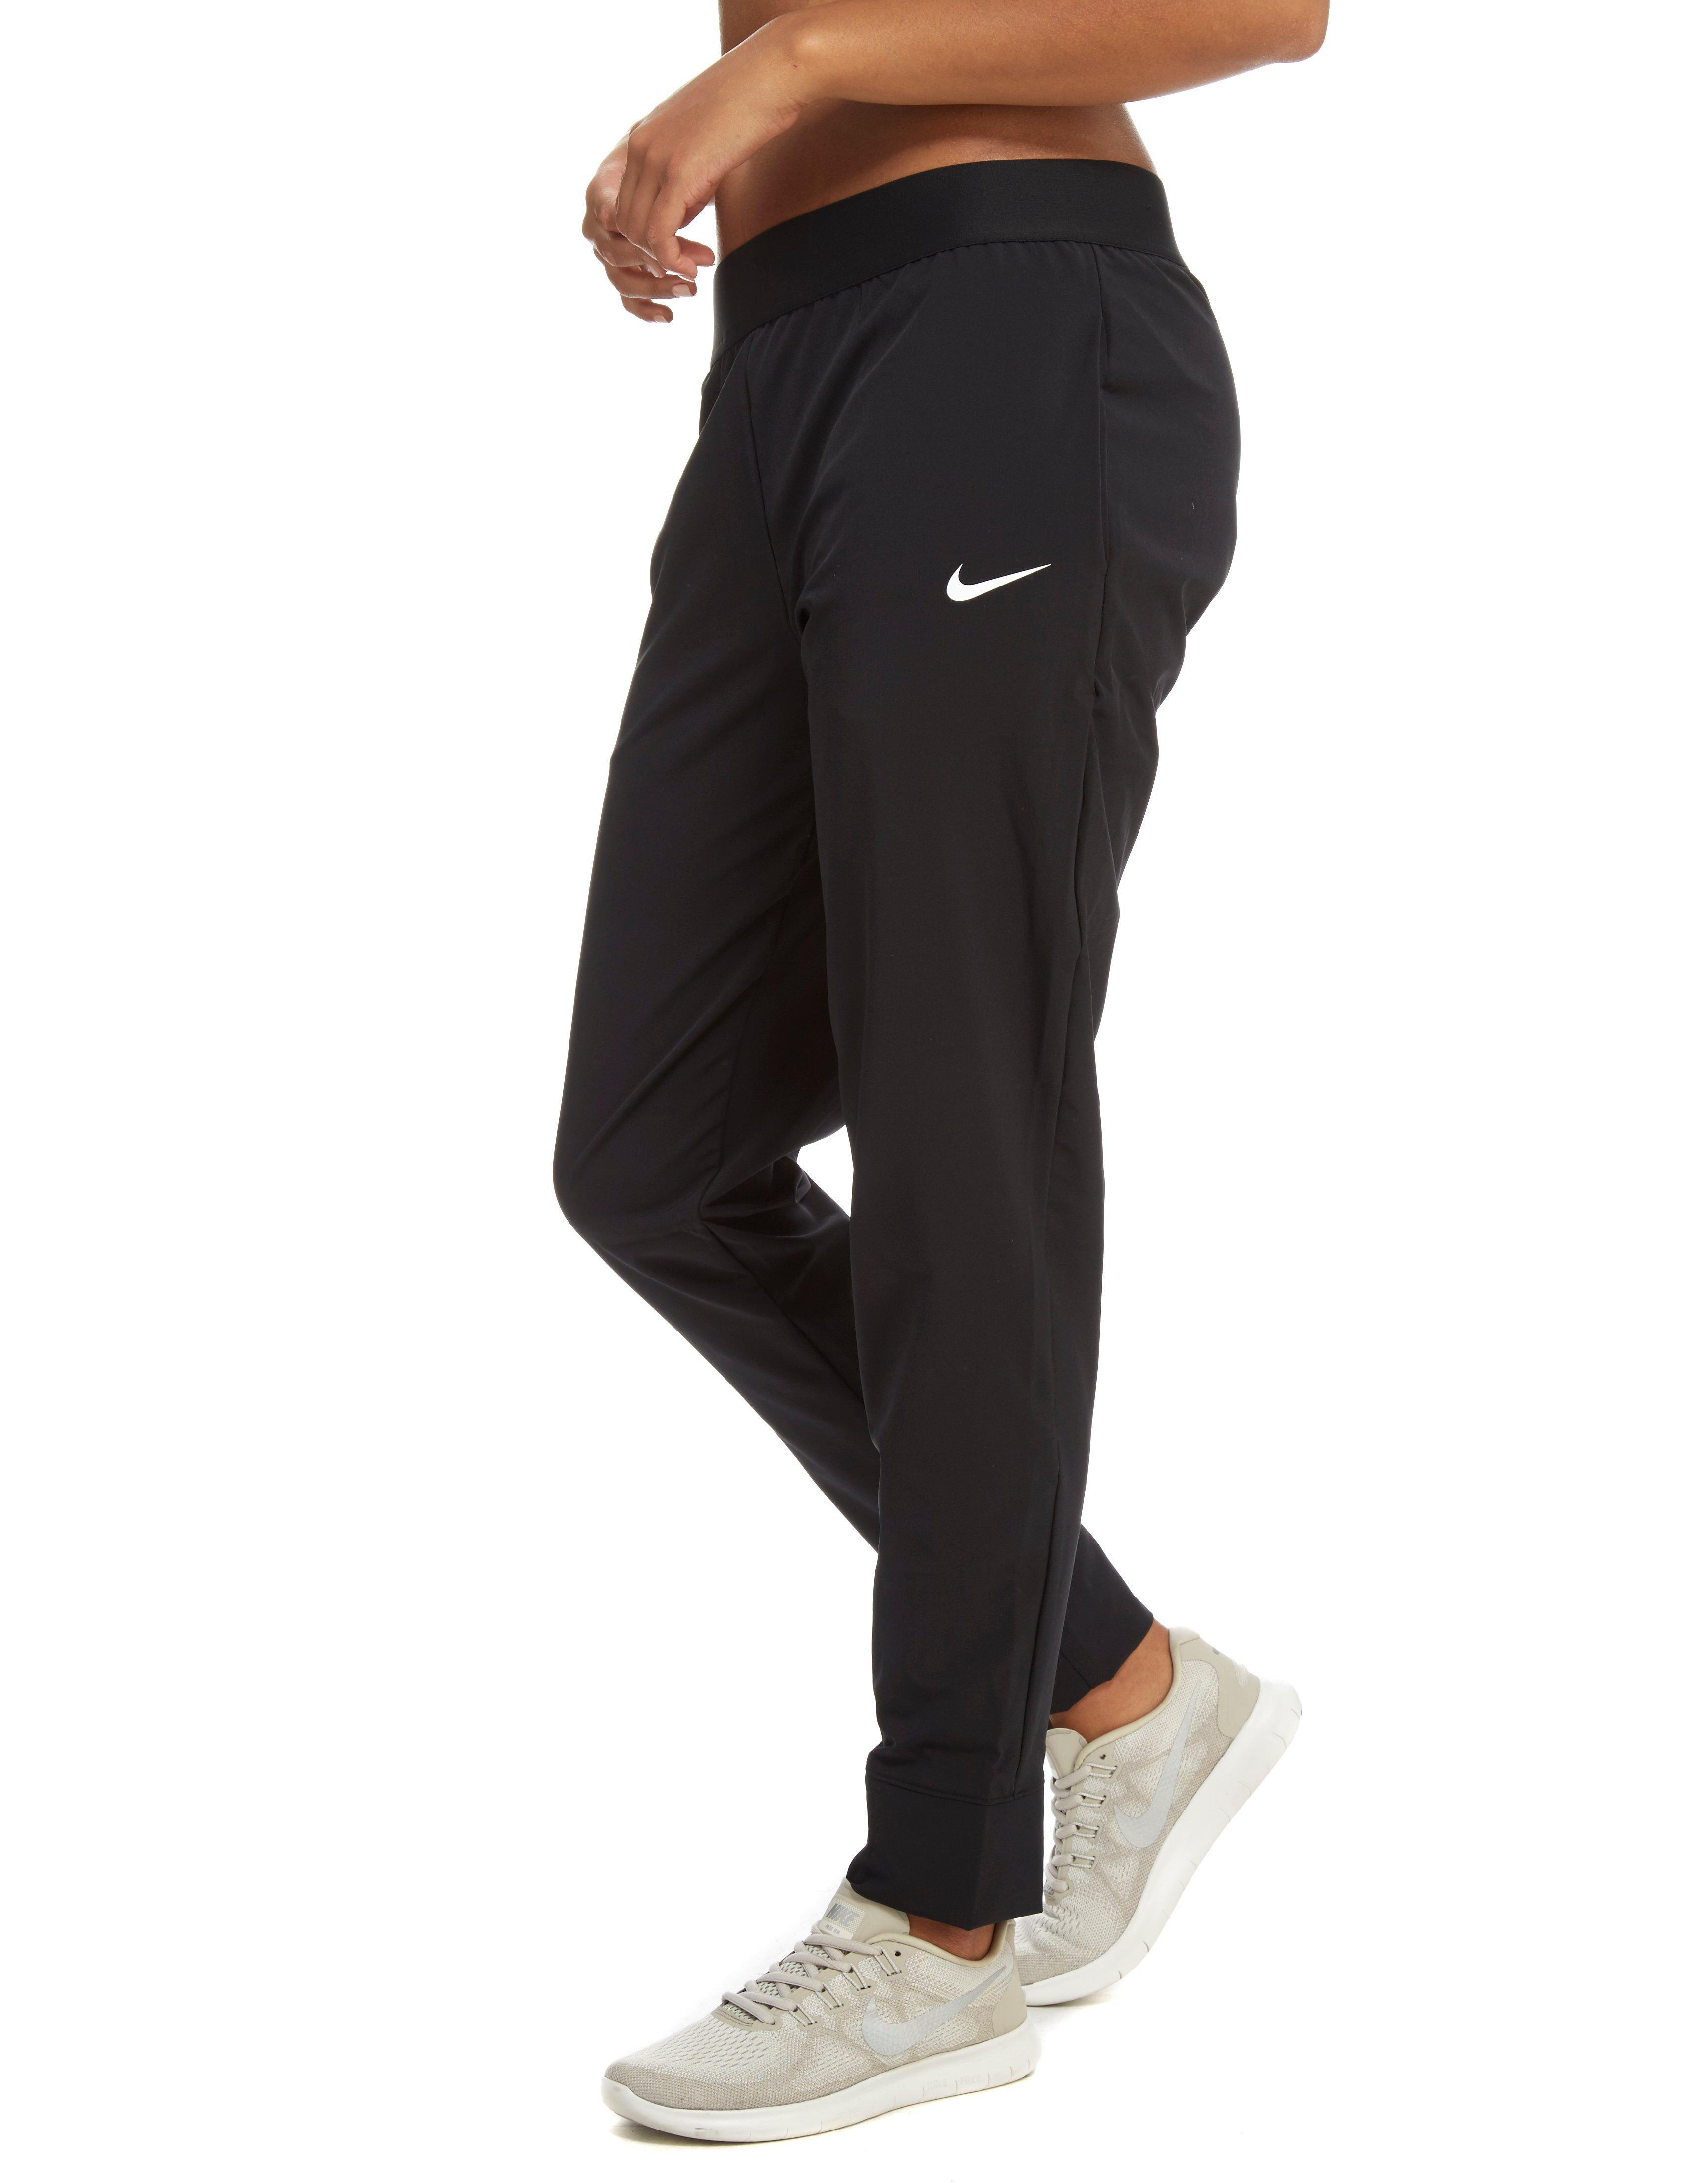 New Nike Legendary Dri-Fit Freeze Frame Tight Womens Long Training Pants 642524 | EBay